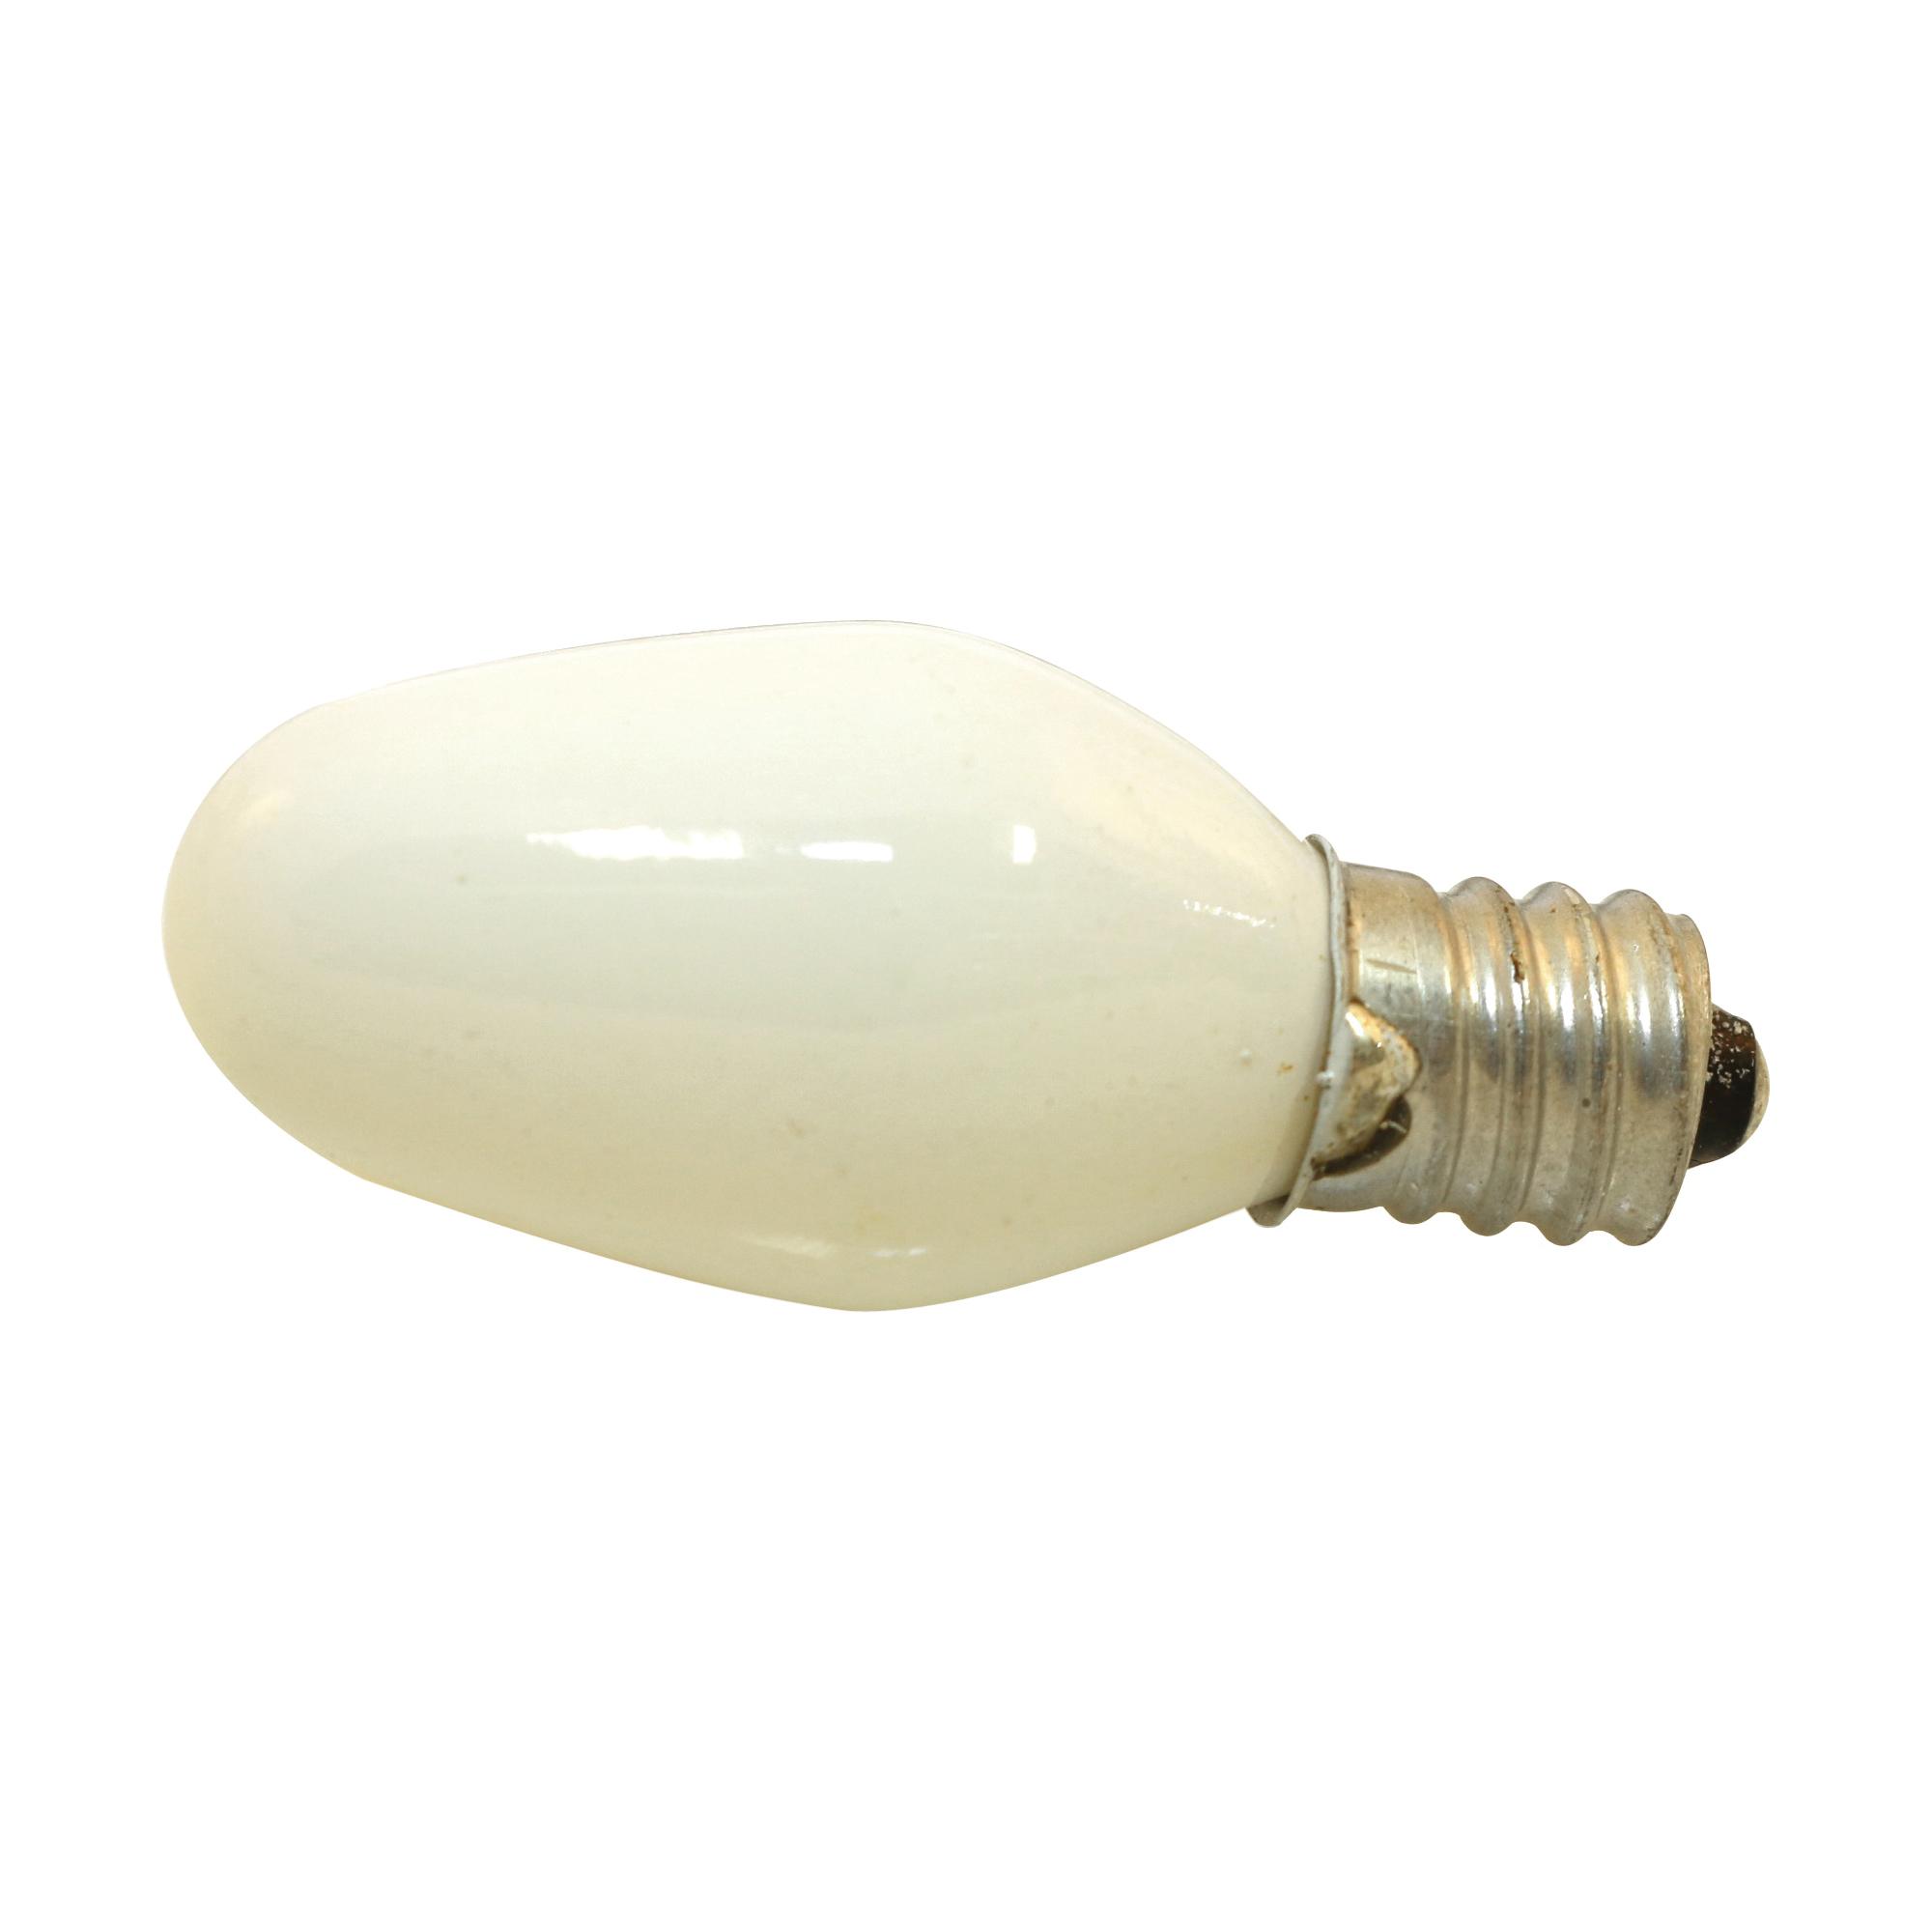 Picture of Sylvania 13553 Incandescent Lamp, 4 W, Candelabra E12 Lamp Base, 2850 K Color Temp, 3000 hr Average Life